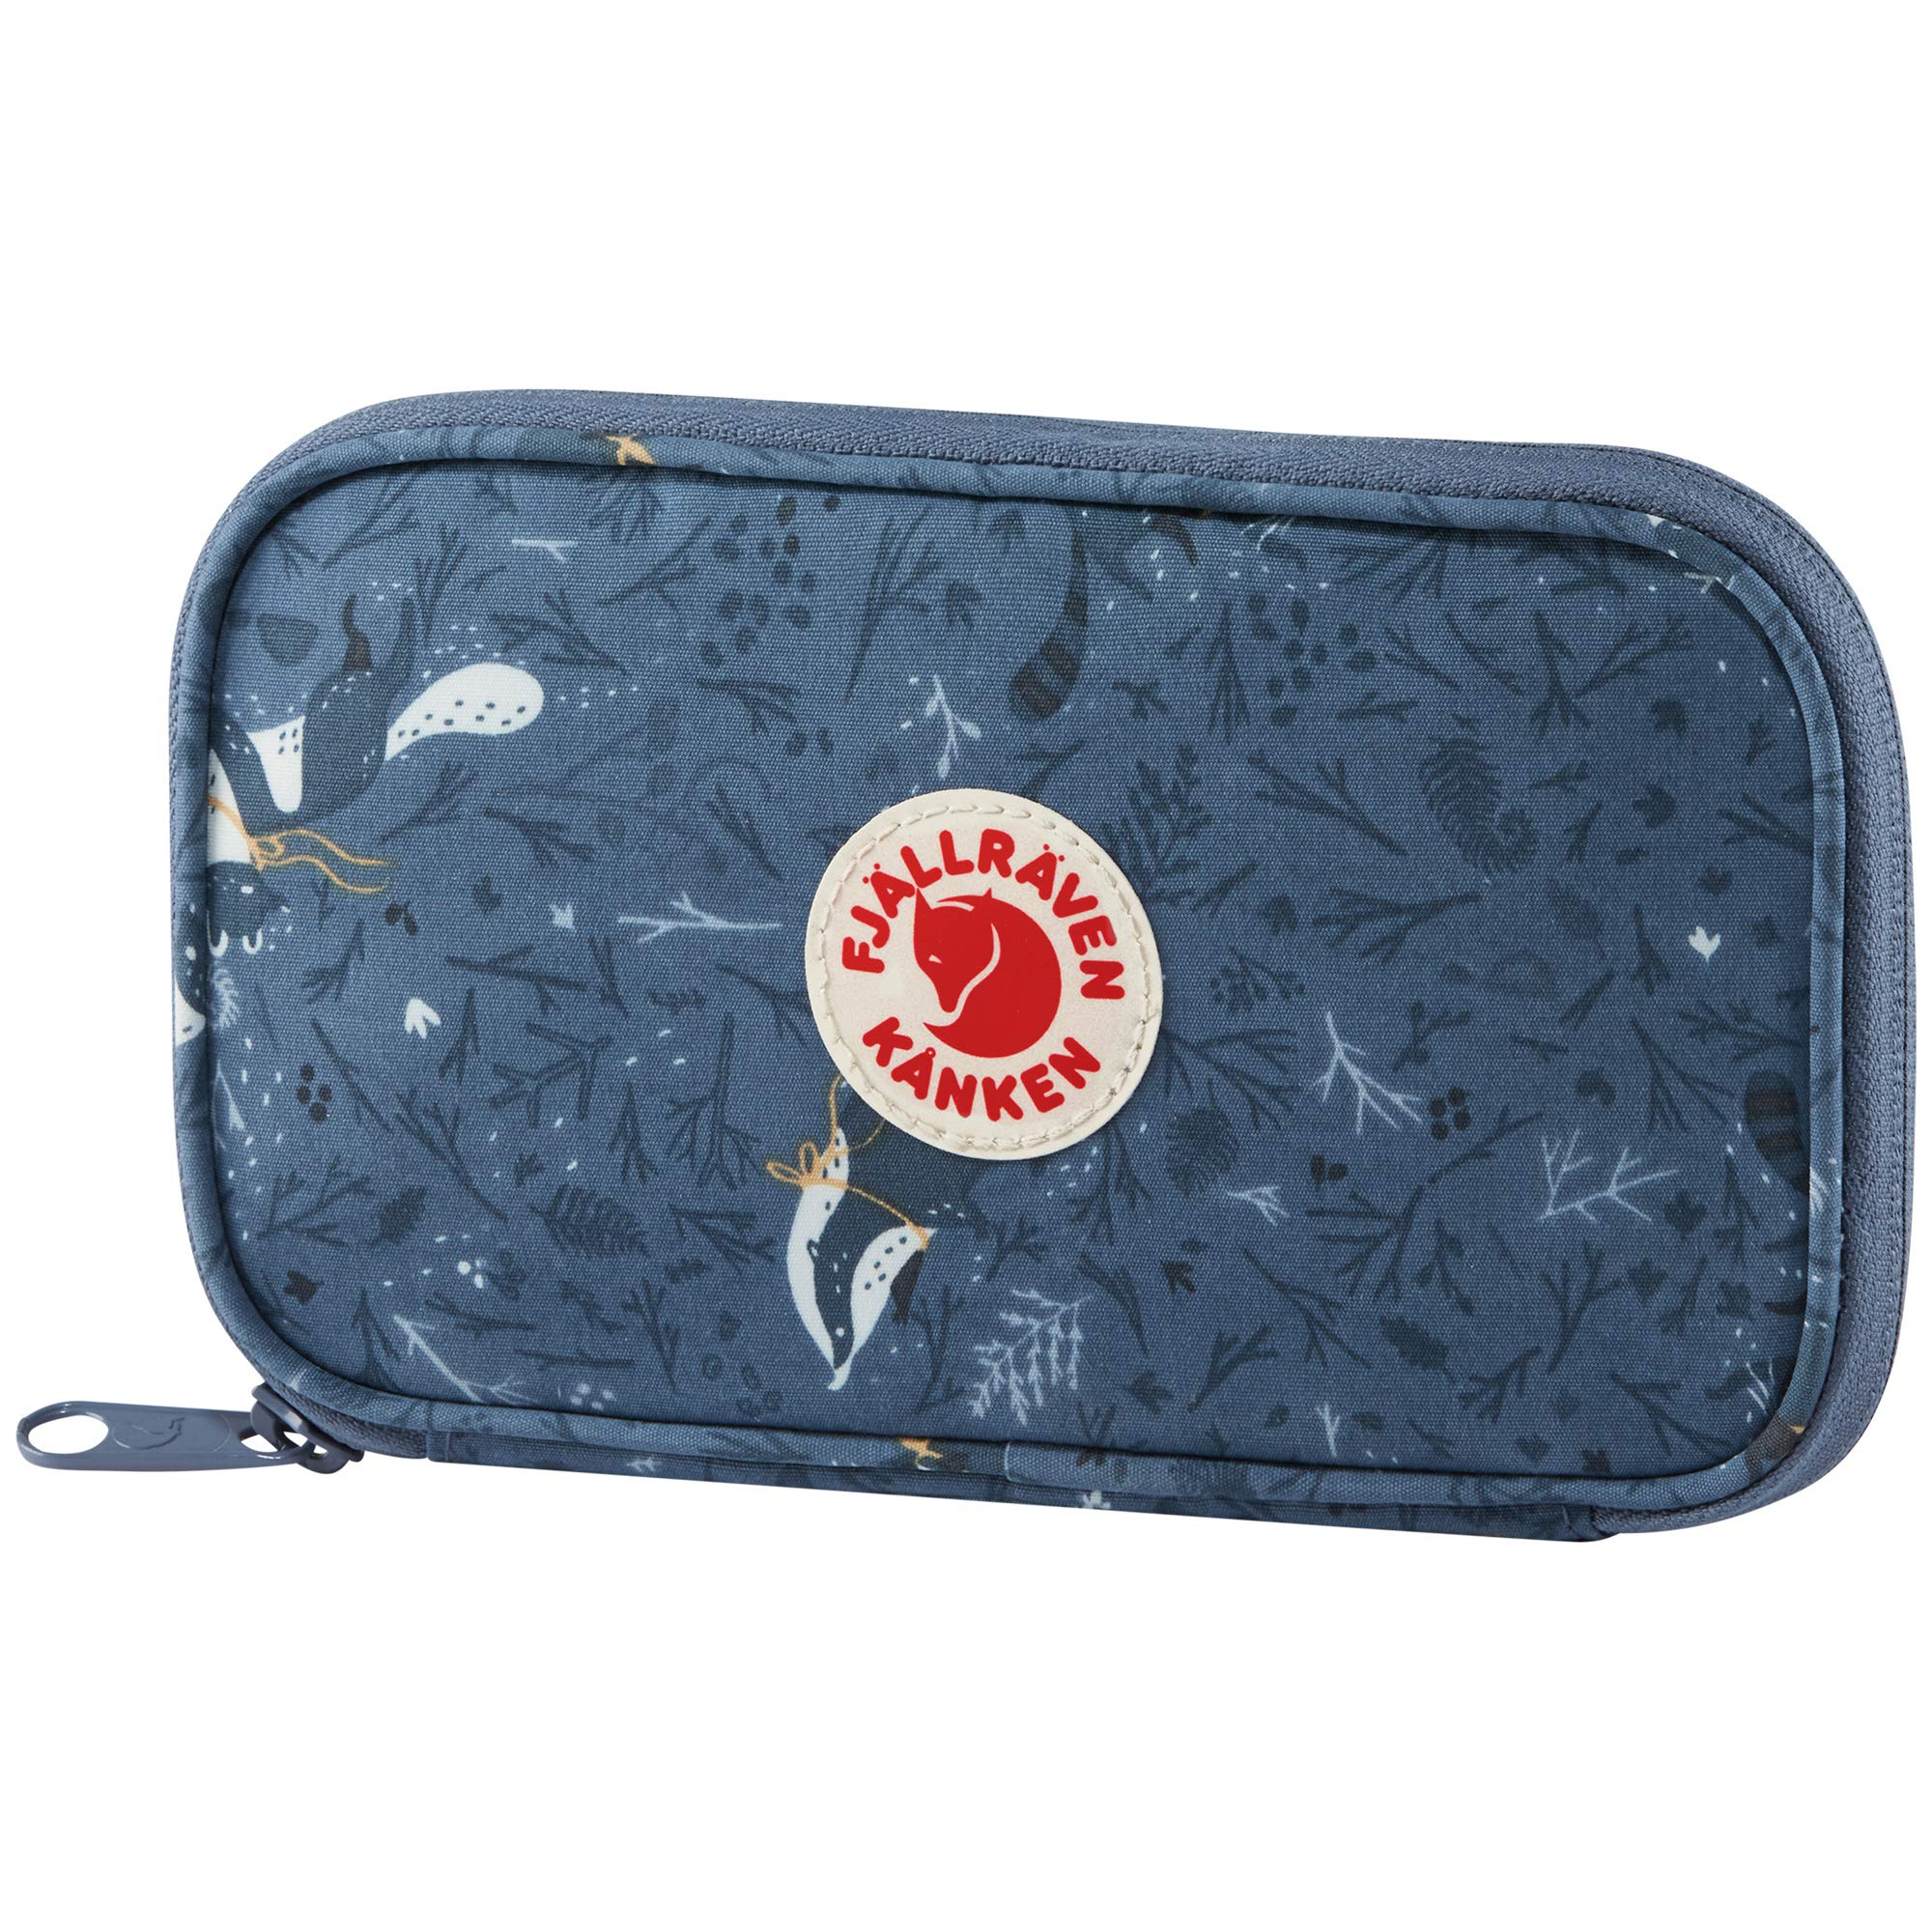 Fjallraven - Kanken Art Travel Wallet, Passport Holder and Organizer, Blue Fable by Fjallraven